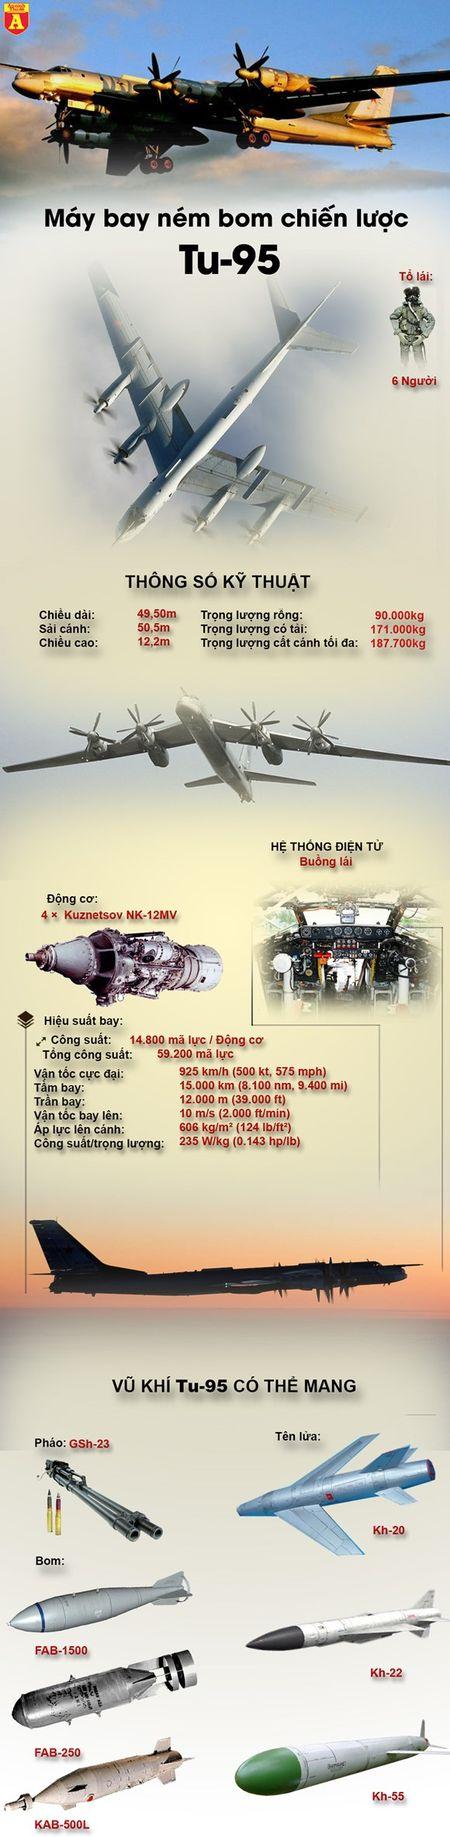 Oanh tac co Tu-95 va sau thap ky de doa sieu cuong My - Anh 1